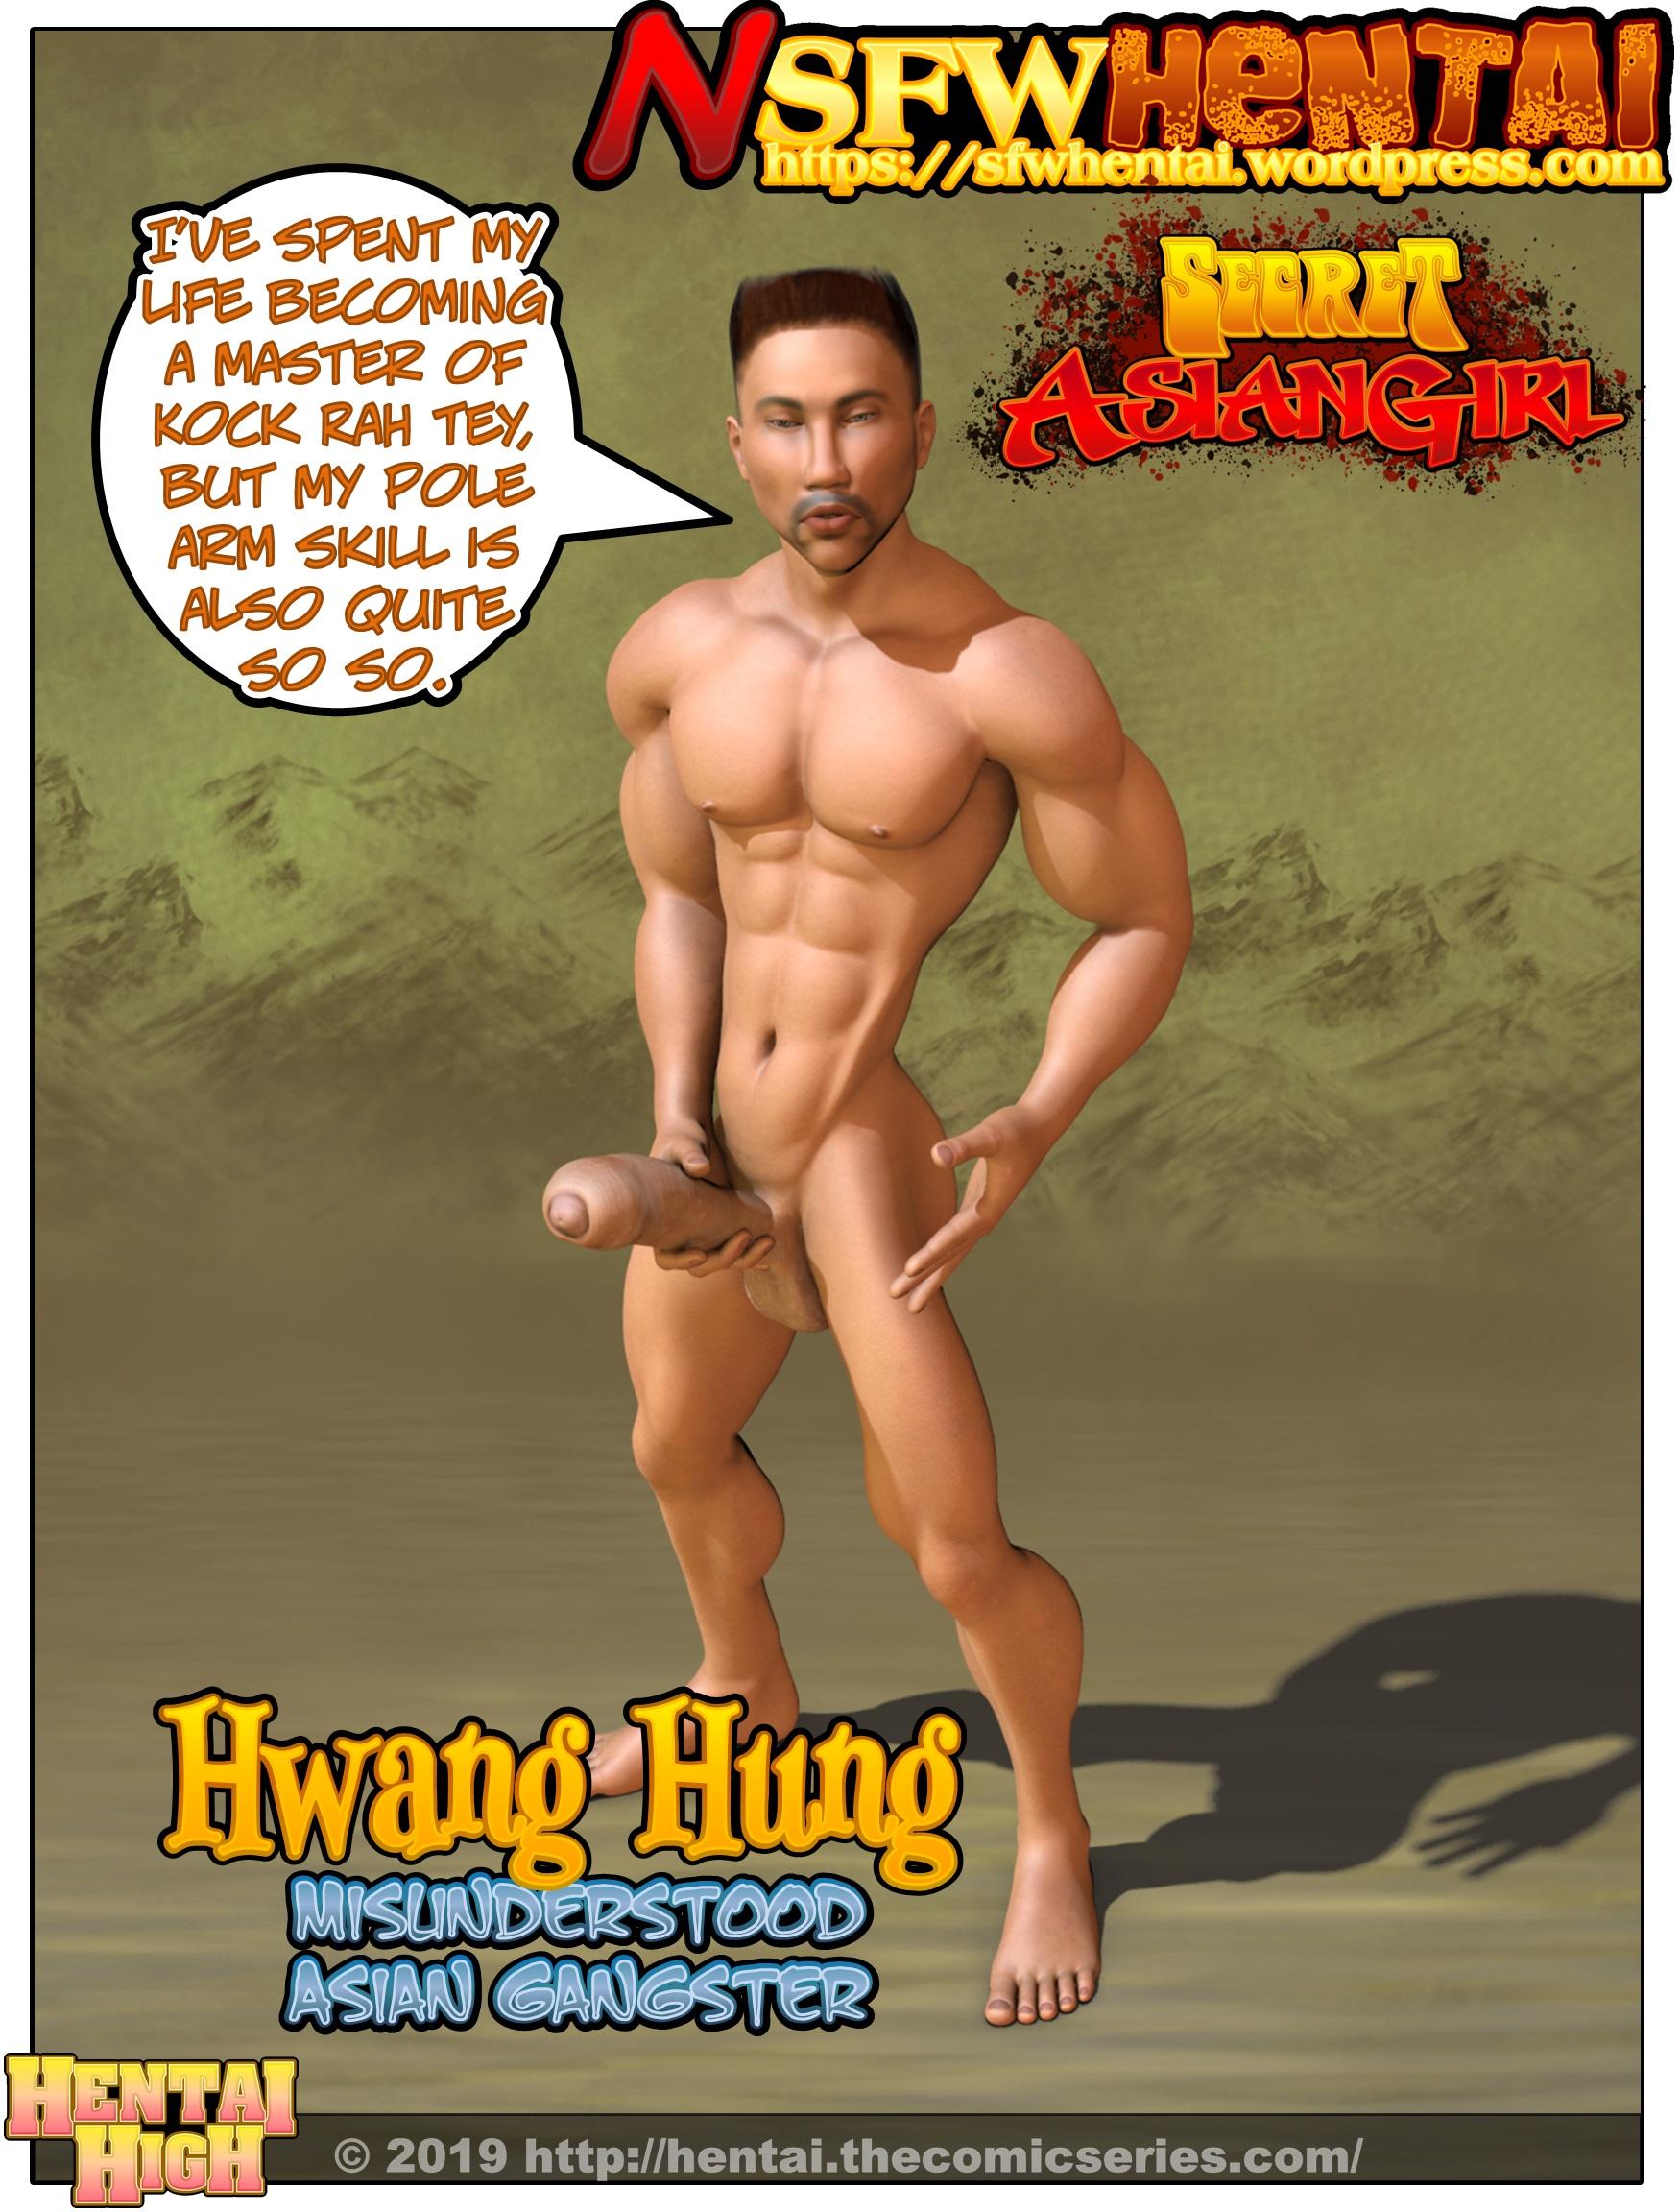 Hung Bishonen Martial Arts Master Asian Porn Gangster Stud Huang Hung.